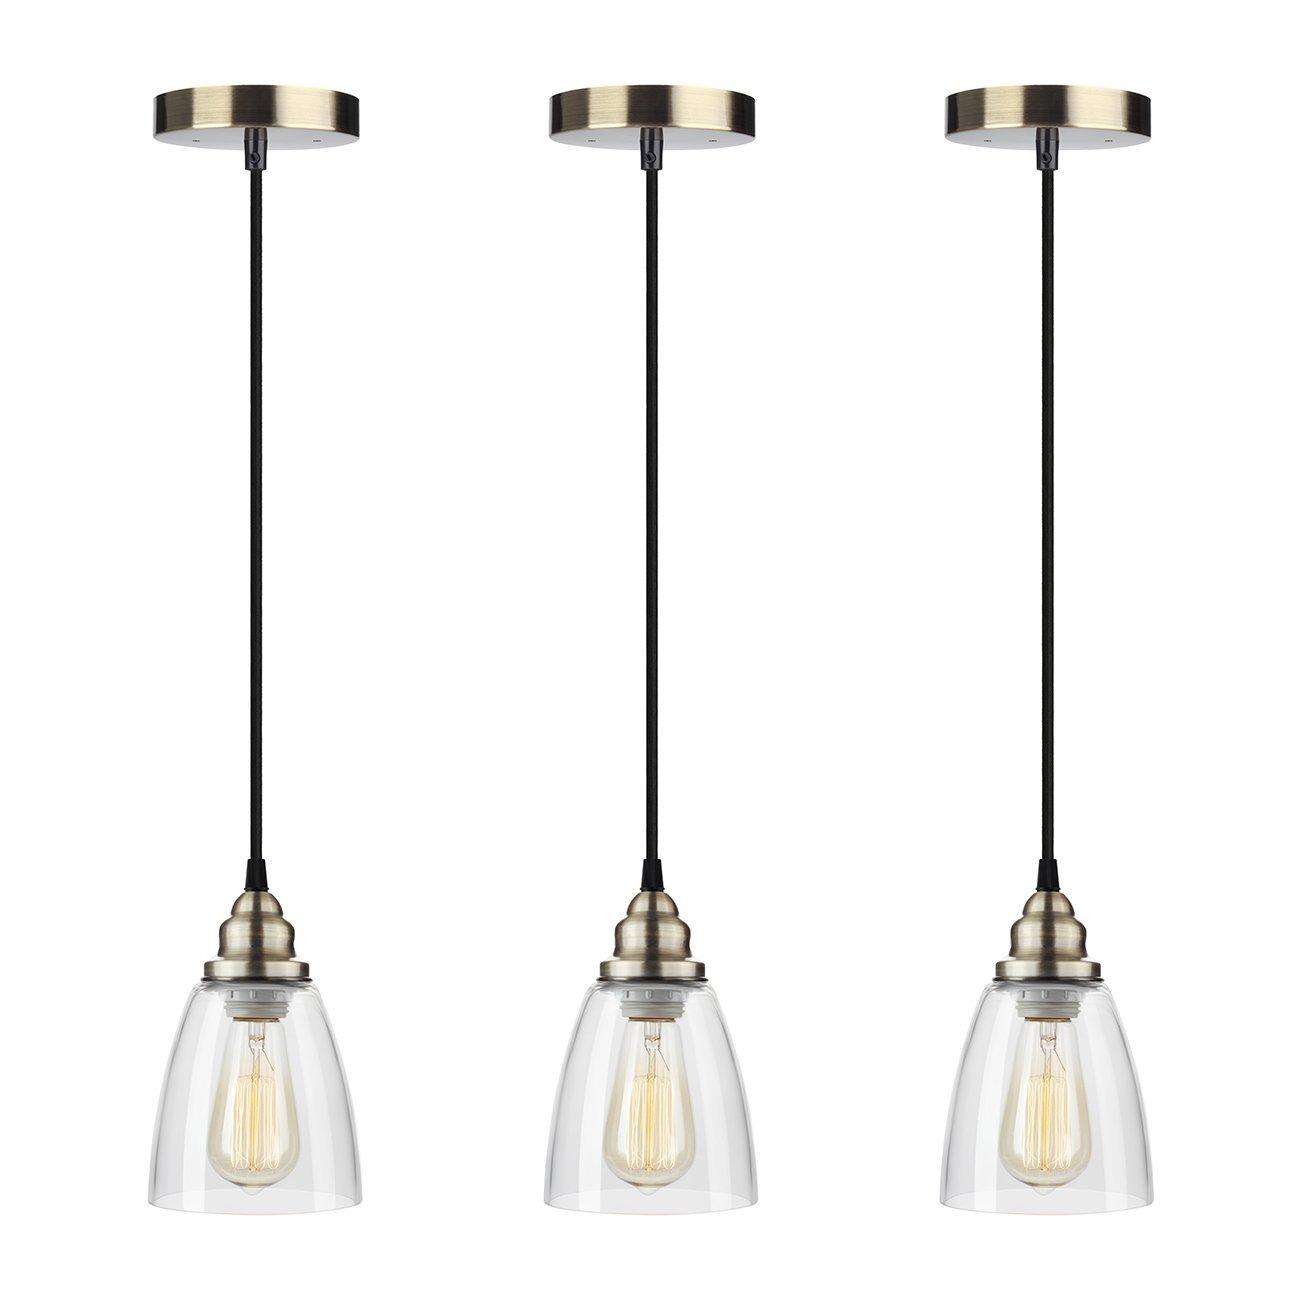 Industrial Edison Mini Glass 3-Light Pendant Hanging Lamp Fixture Shine HAI Modern Industrial Edison Vintage Style